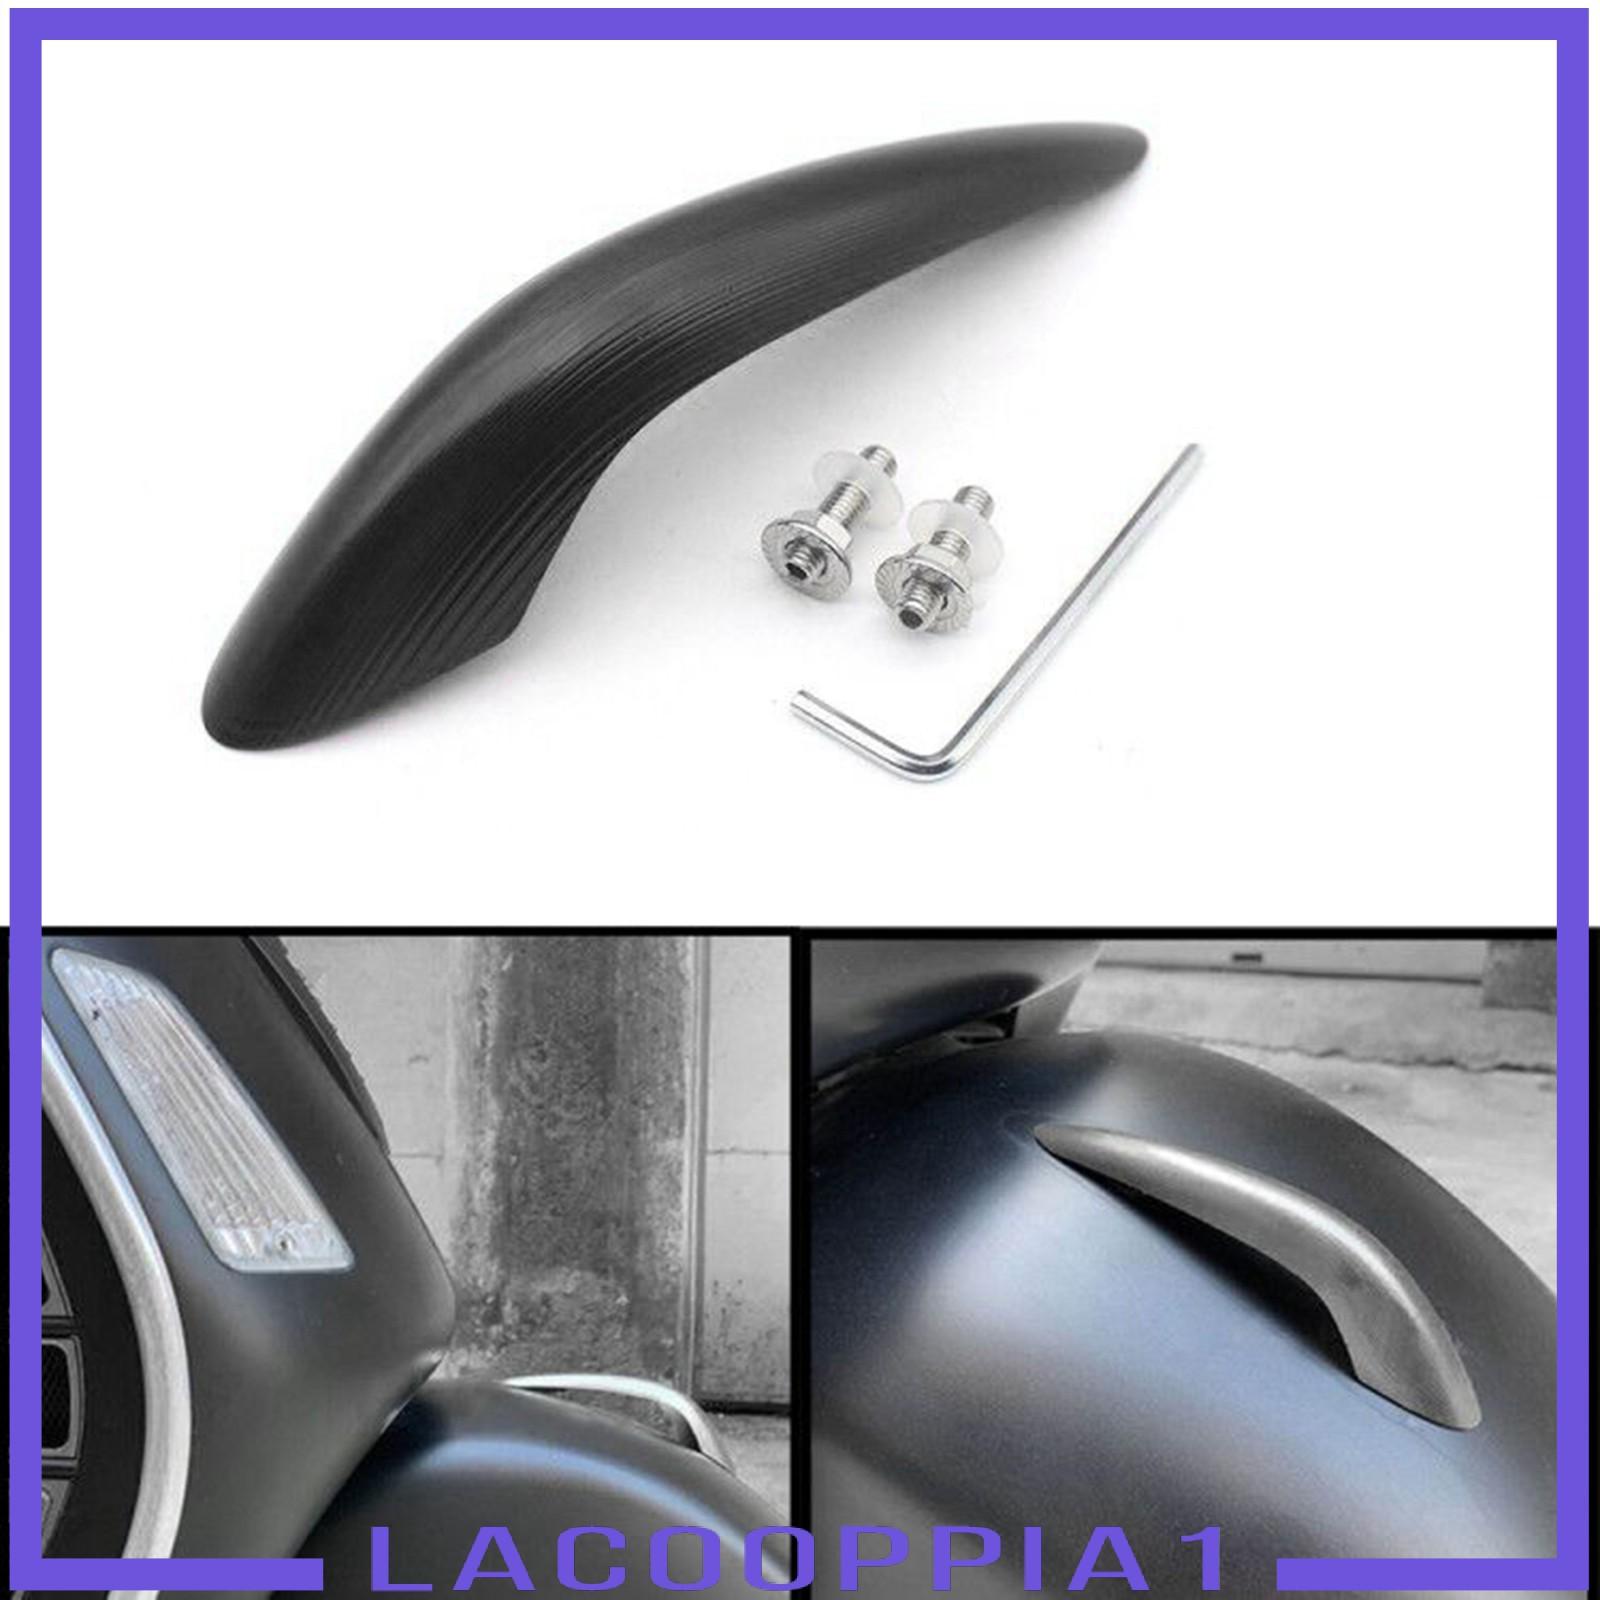 [Lacooppia1] 用於 Vespa Gts Gtv 250 300 的 Cnc 鋁前擋泥板擋泥板鼻喙